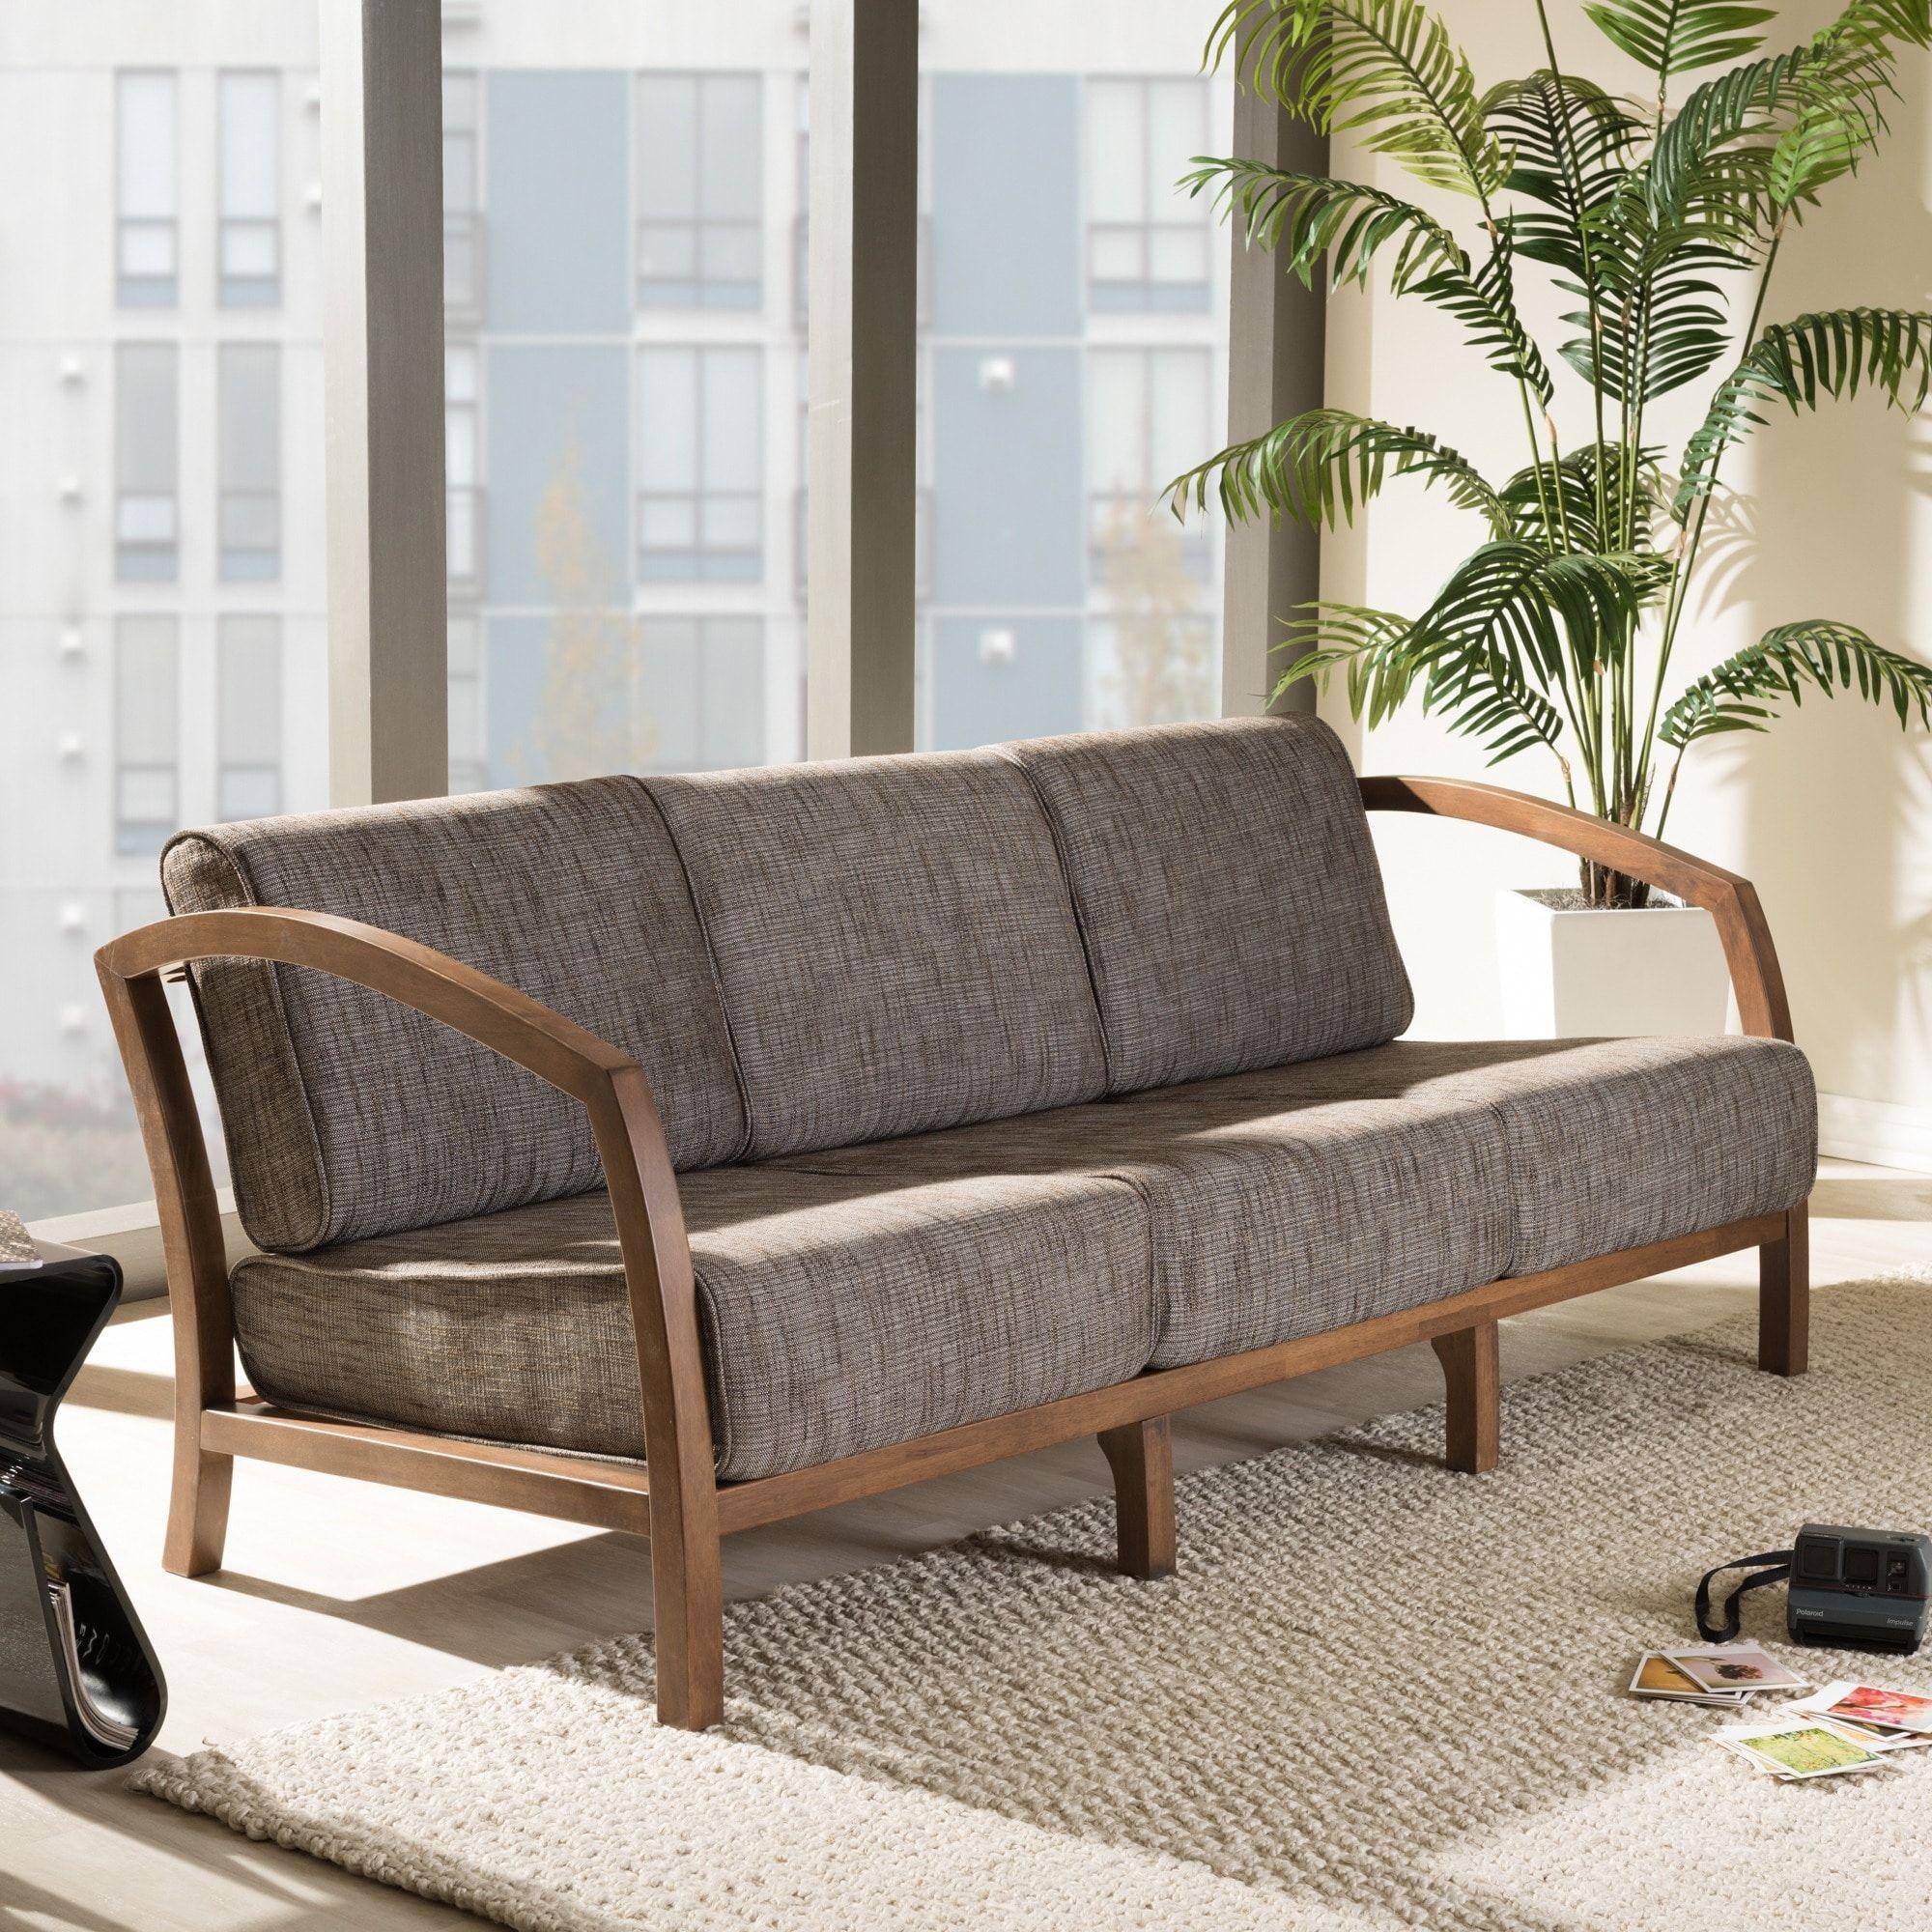 Baxton Studio Velda Modern and Contemporary Walnut Wood